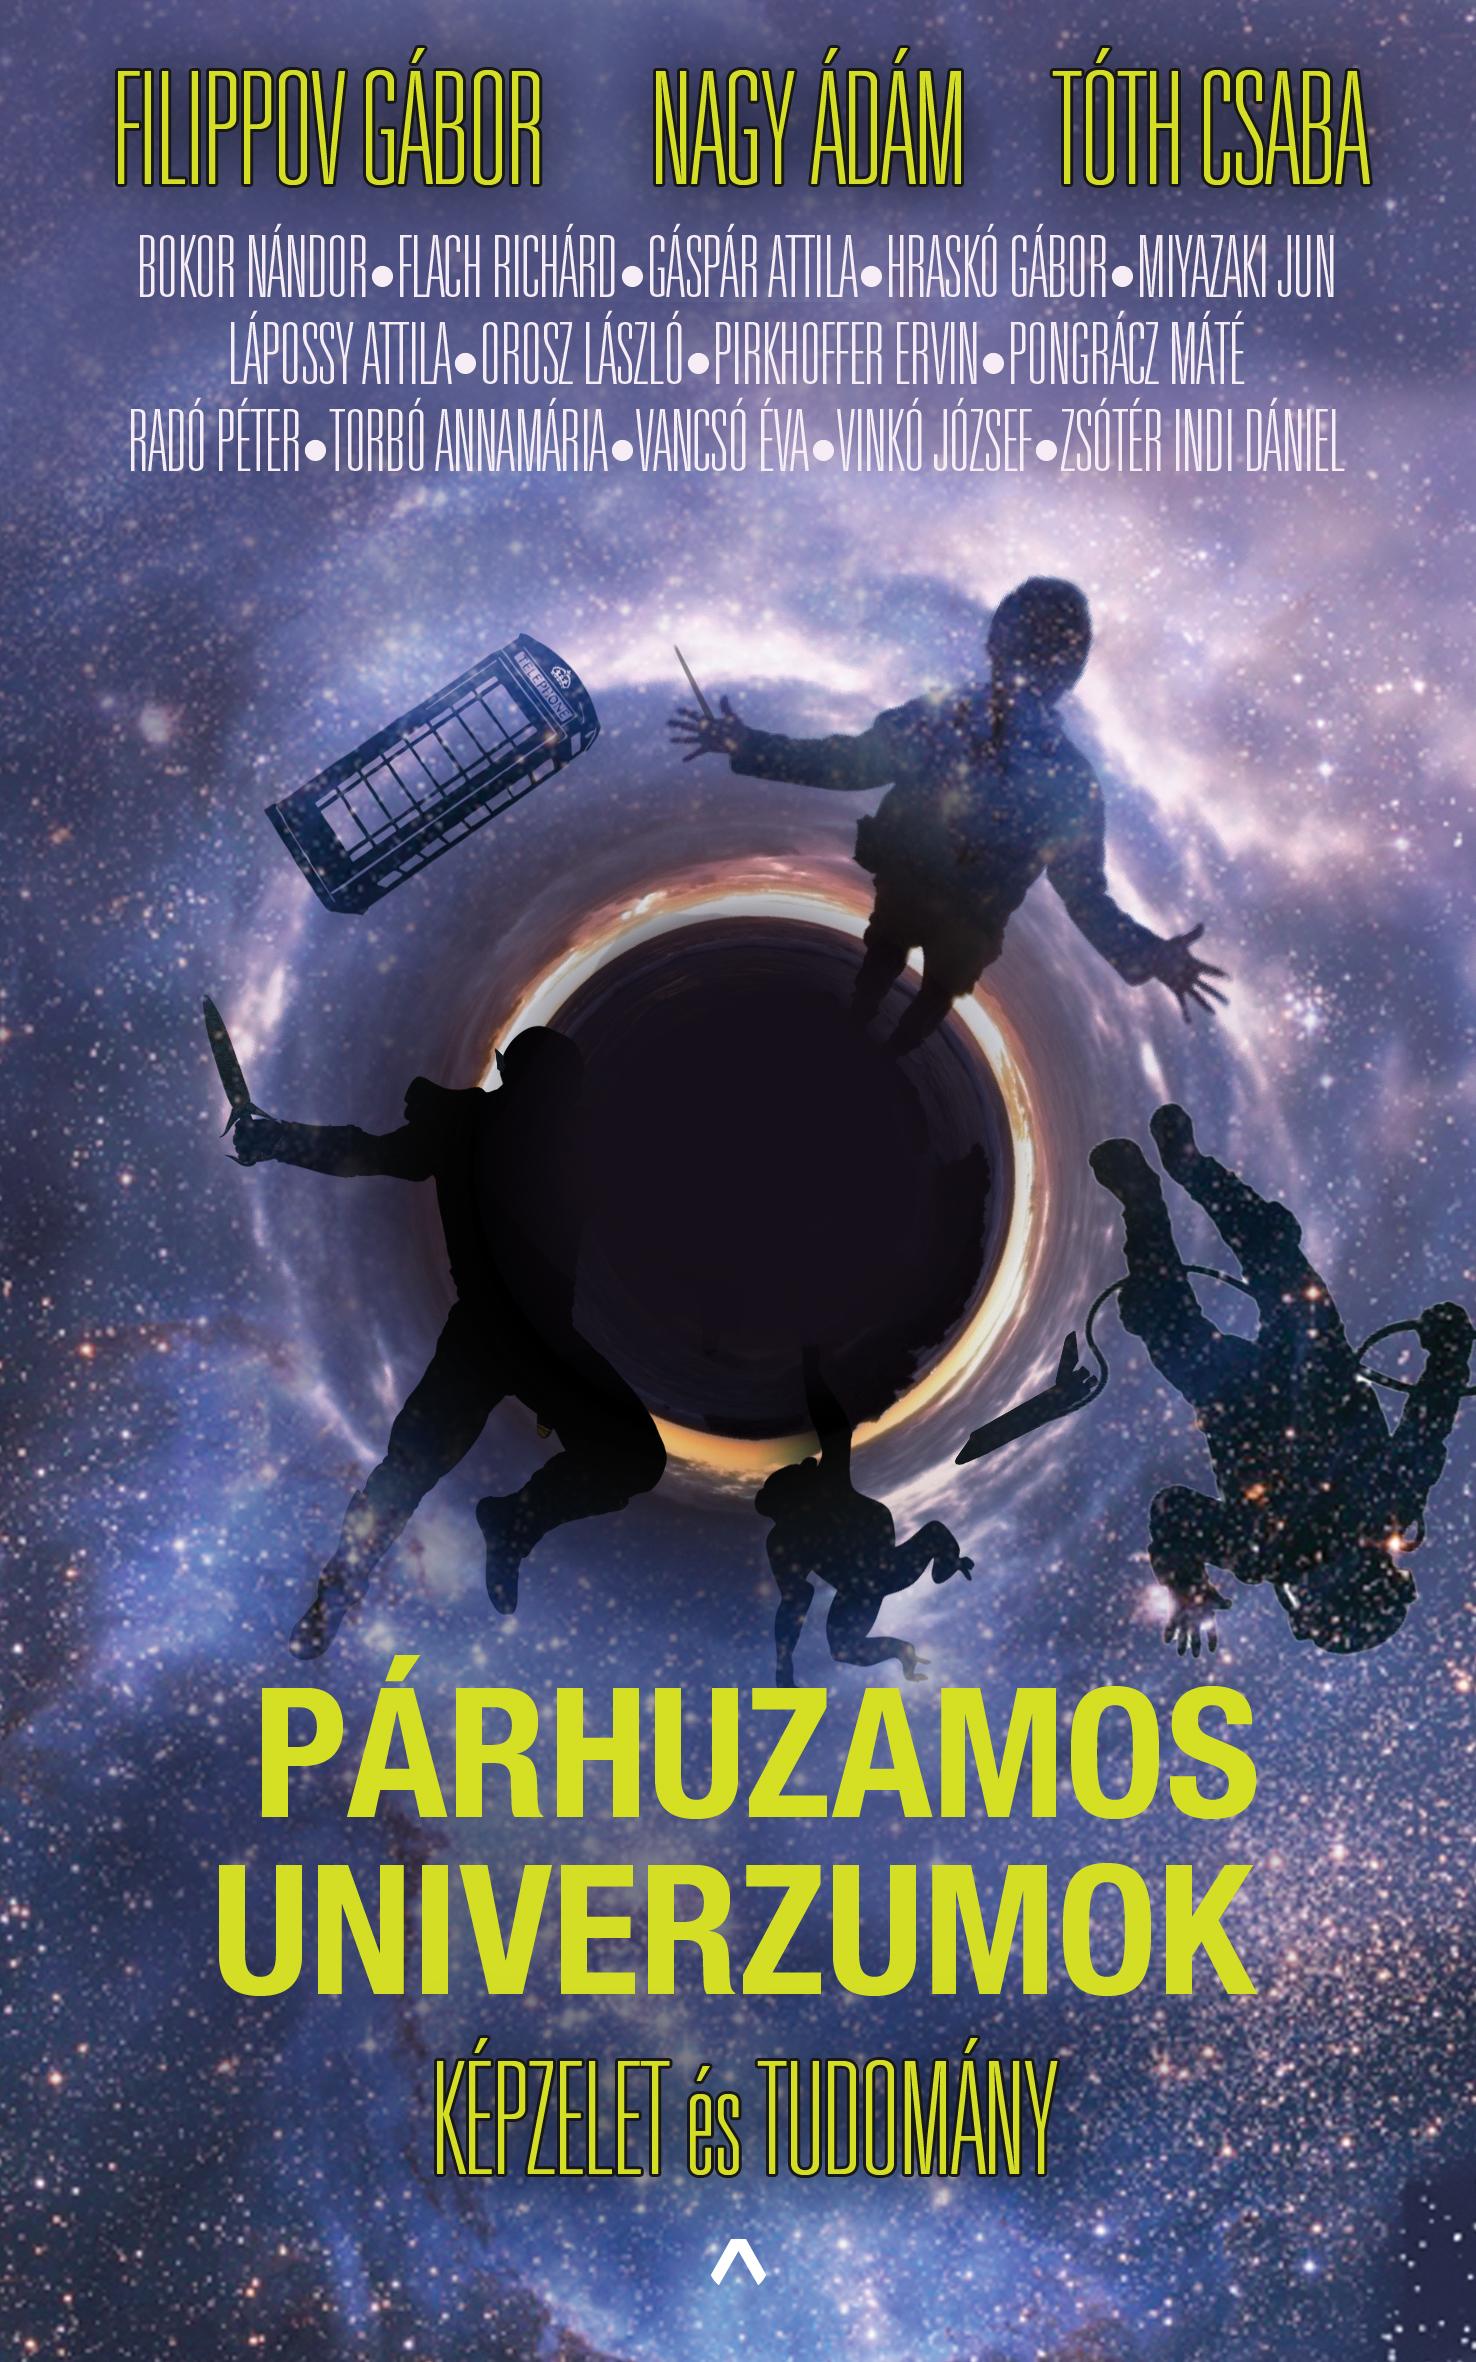 parhuzamos_univerzumok_cover.jpg